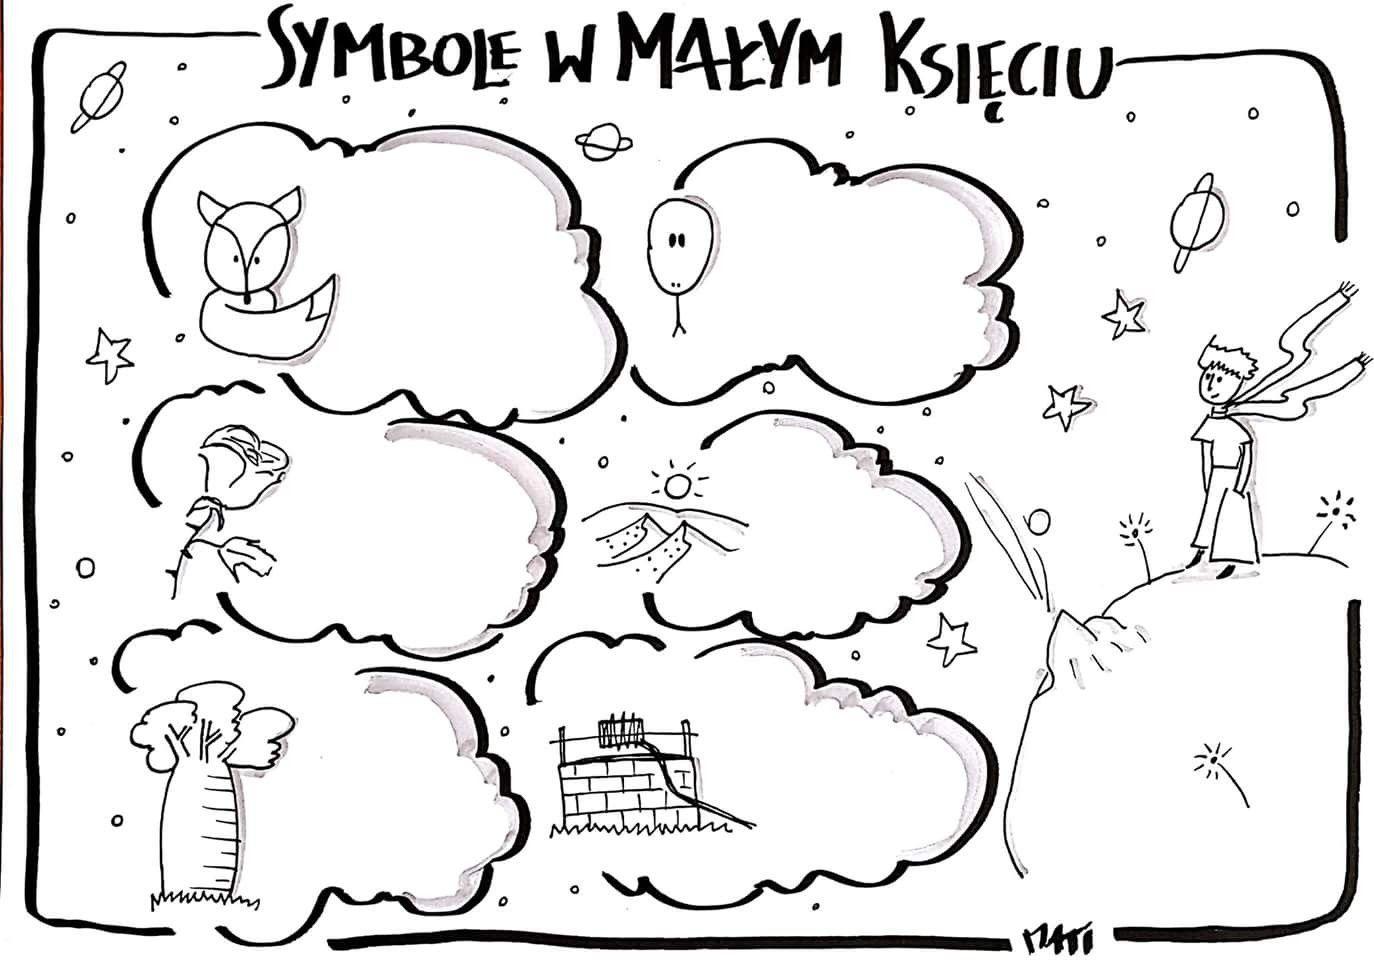 Symbole W Malym Ksieciu Karta Pracy In 2020 Creative Writing Ideas Polish Language Sketchnotes